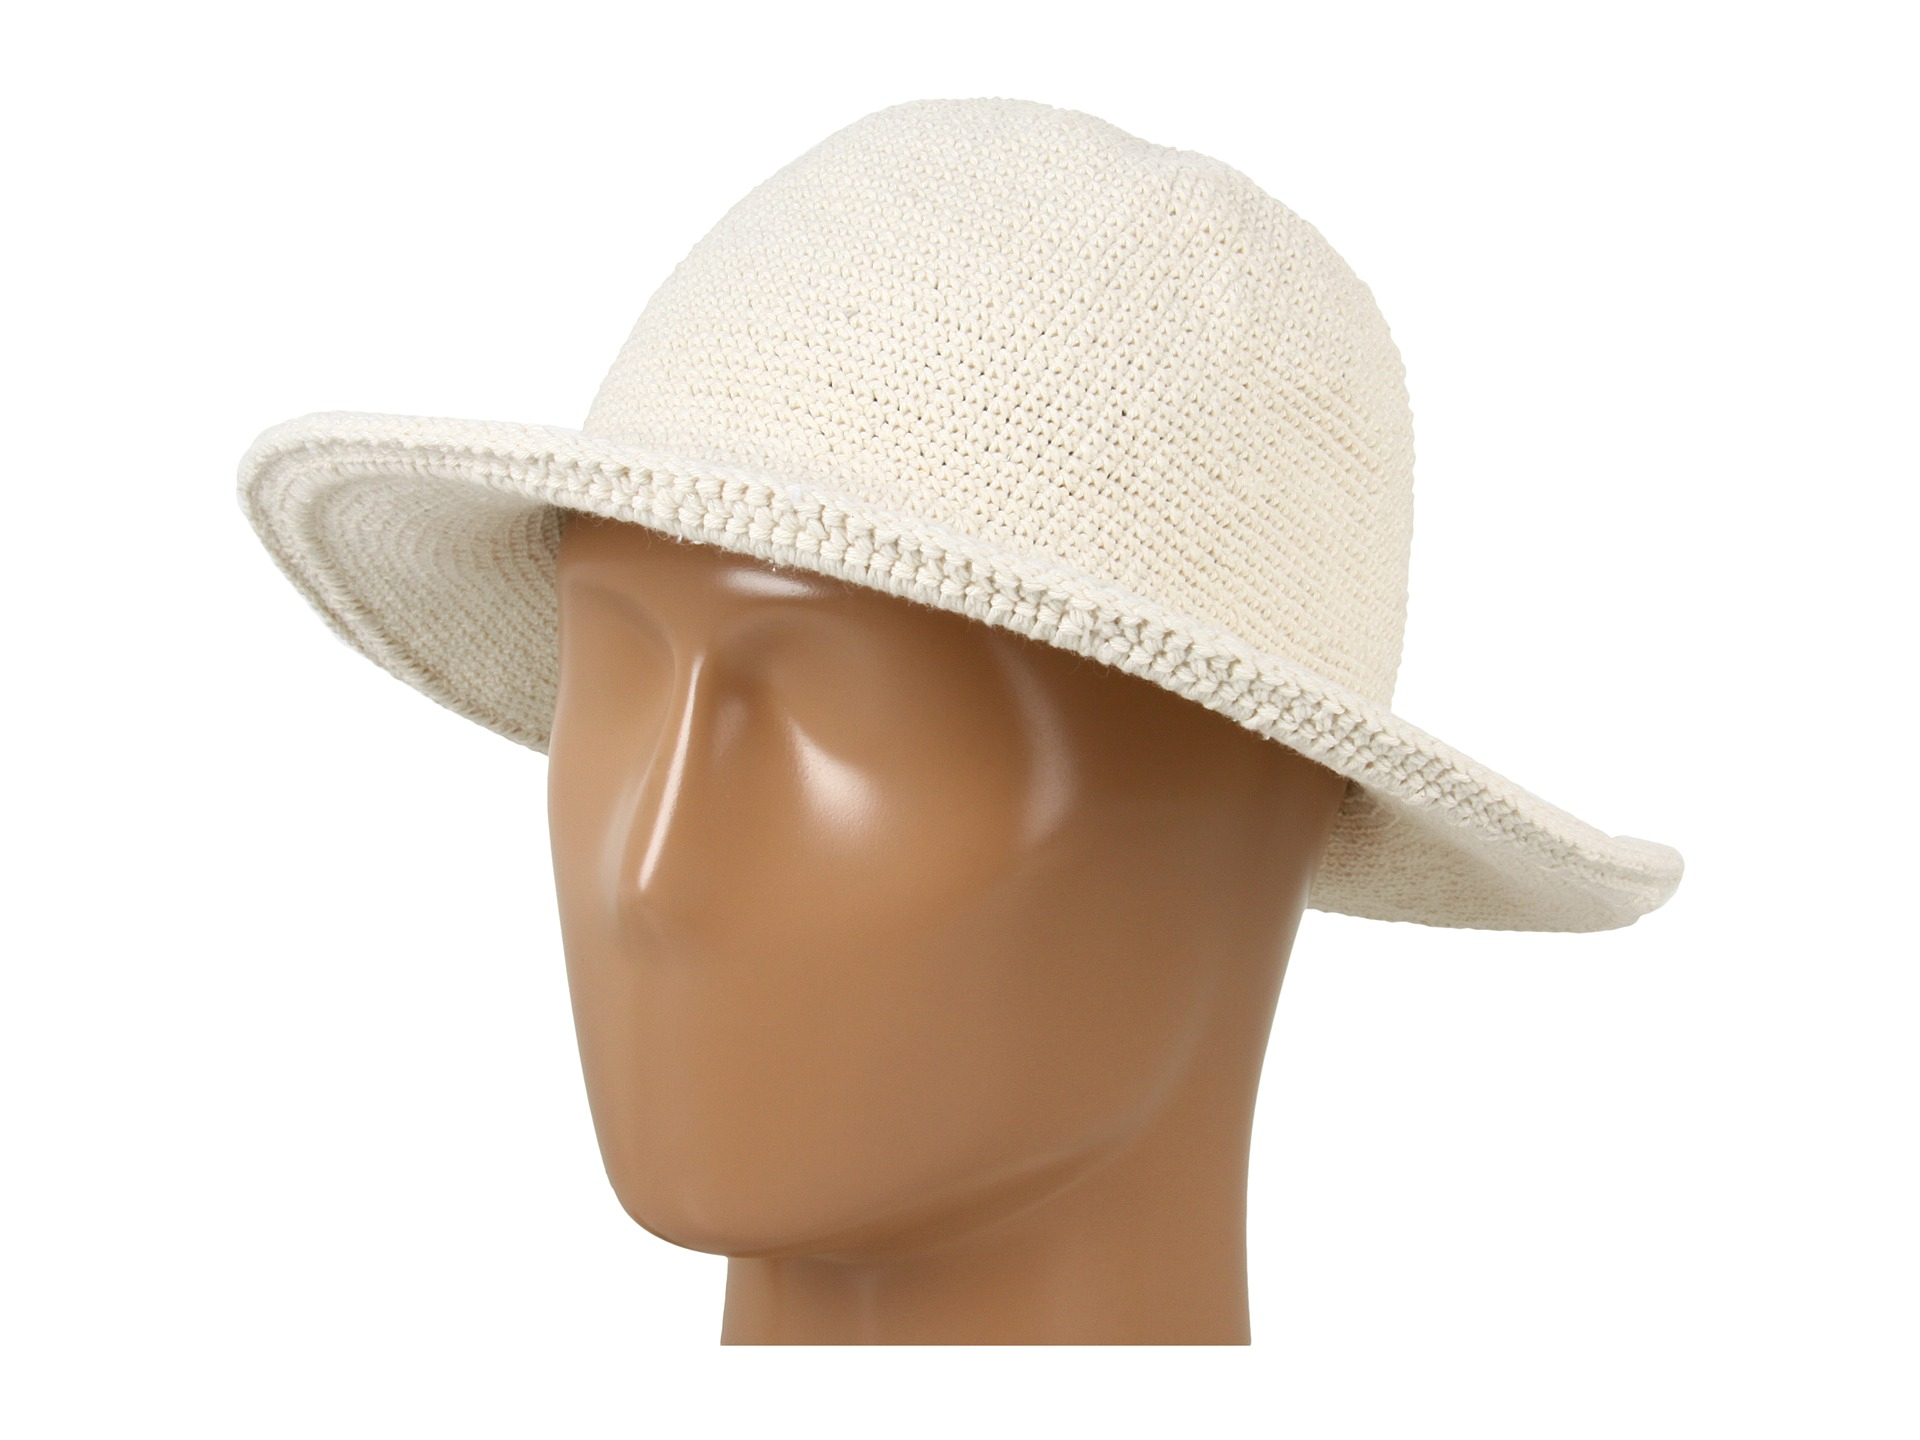 7b167169 San Diego Hat Company Chm5 Cotton Crochet Medium Brim Sun Hat in ...